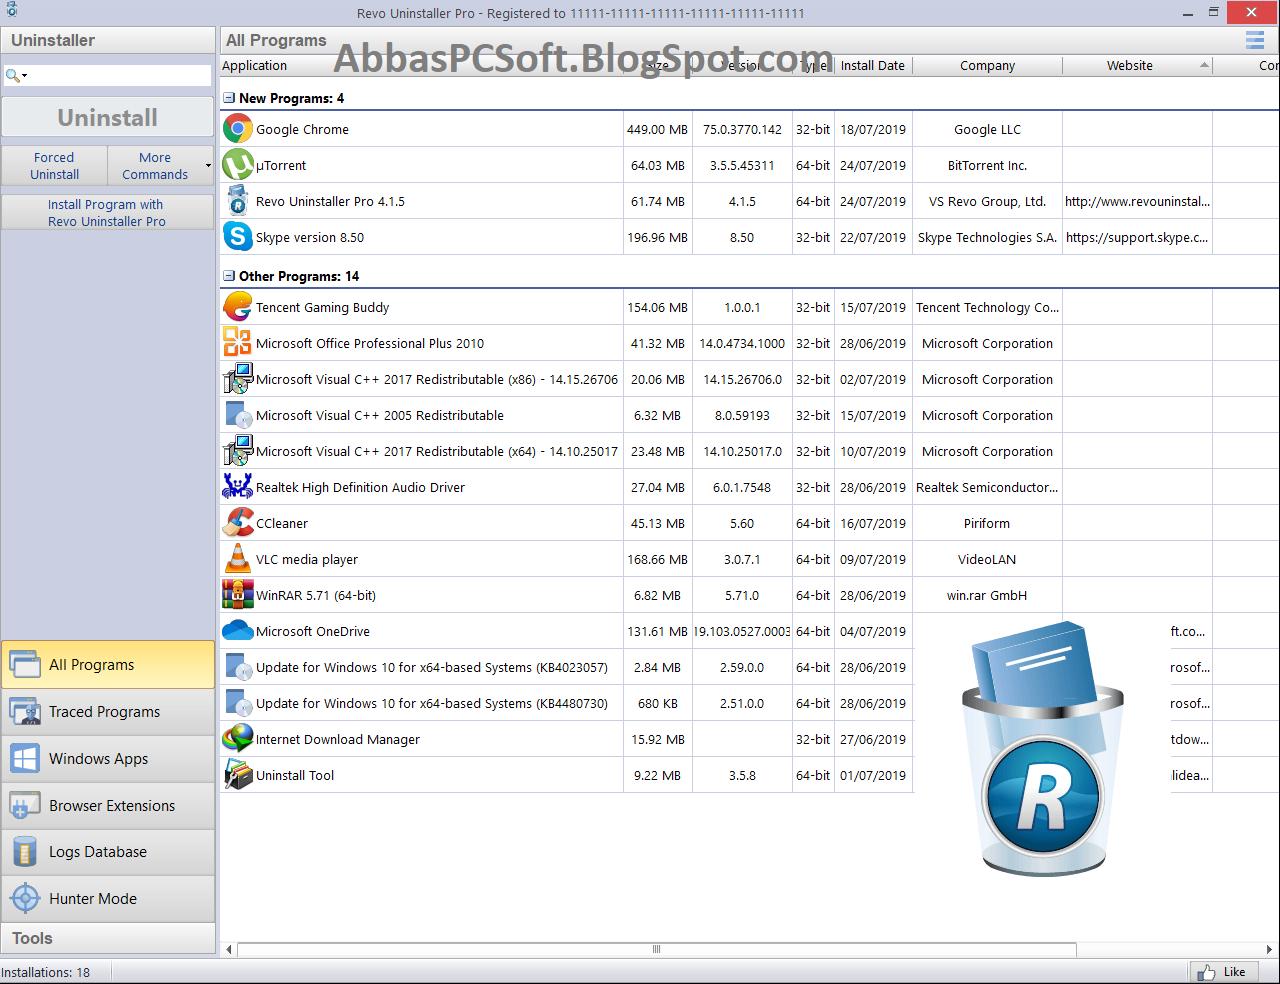 DeskSoft EarthTime 6 0 3 With Patch (Latest Version